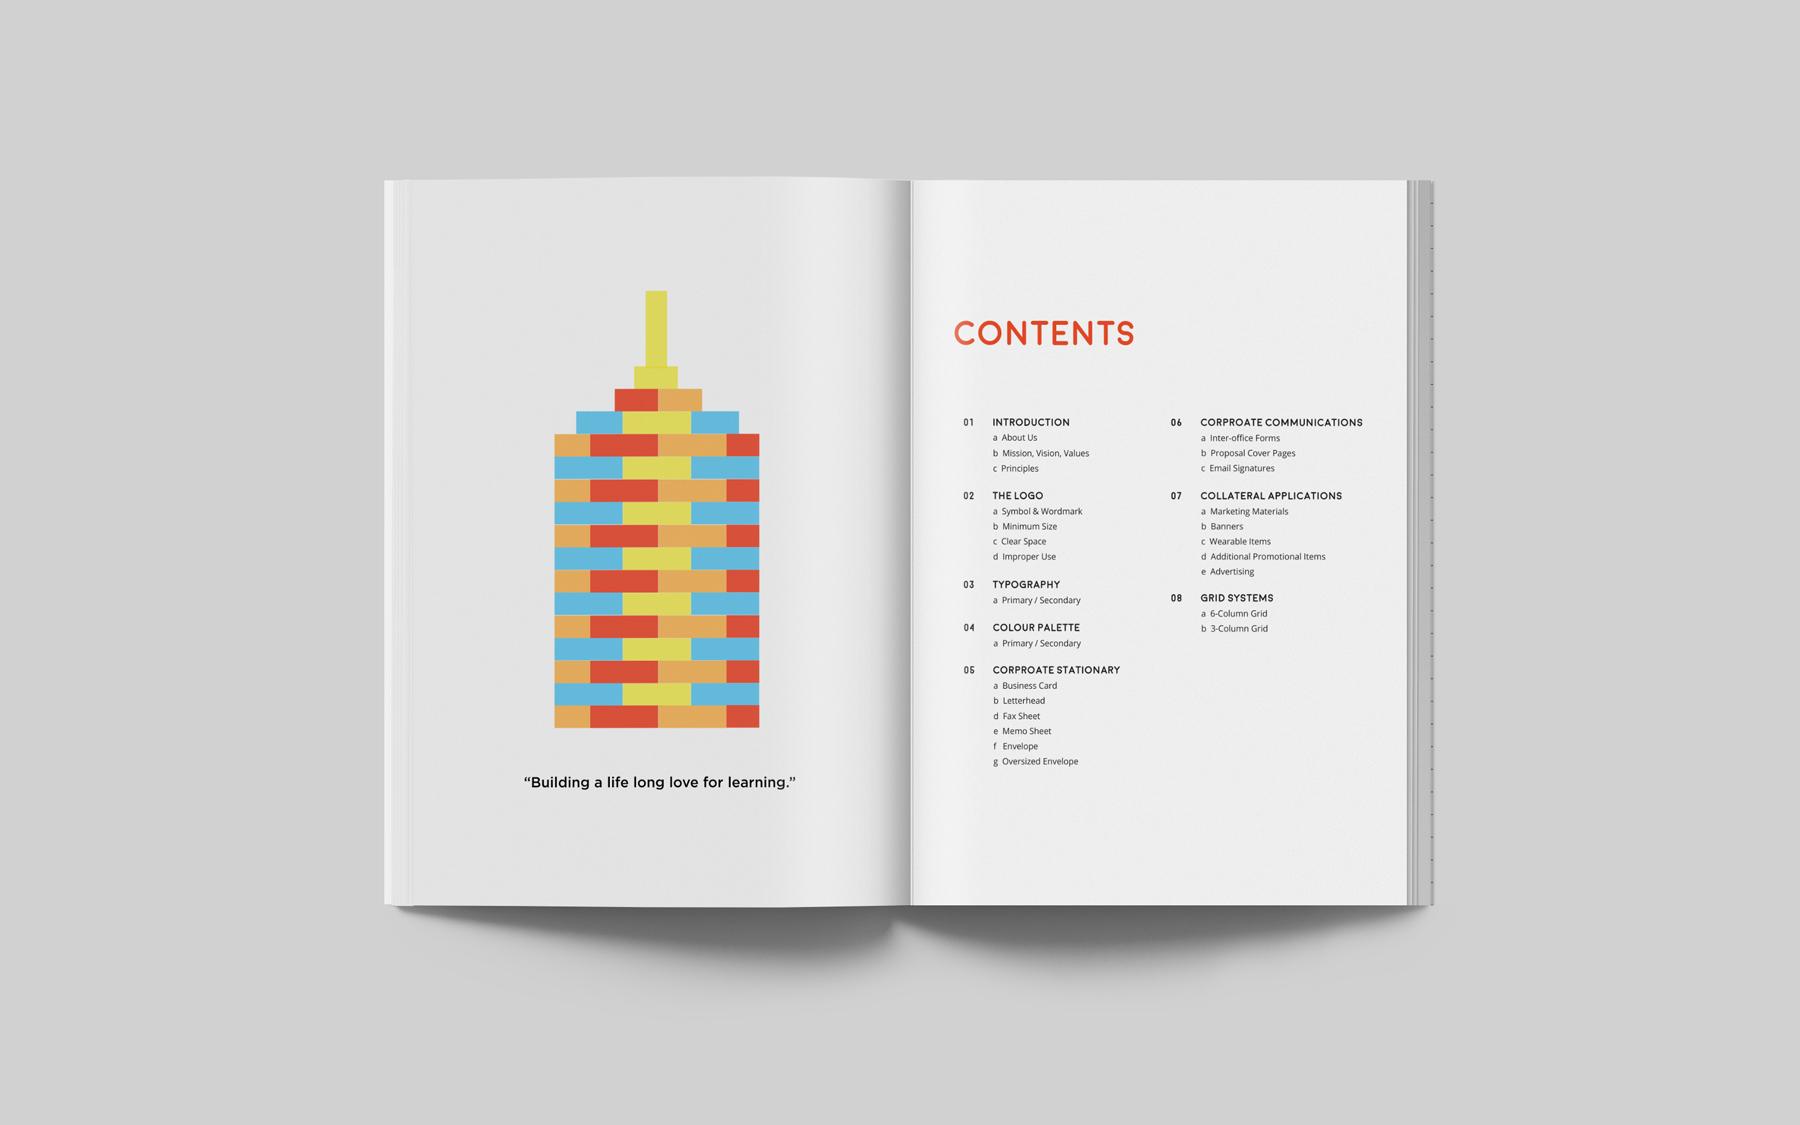 boston-childrens-museum-corporte-identity-contents-page